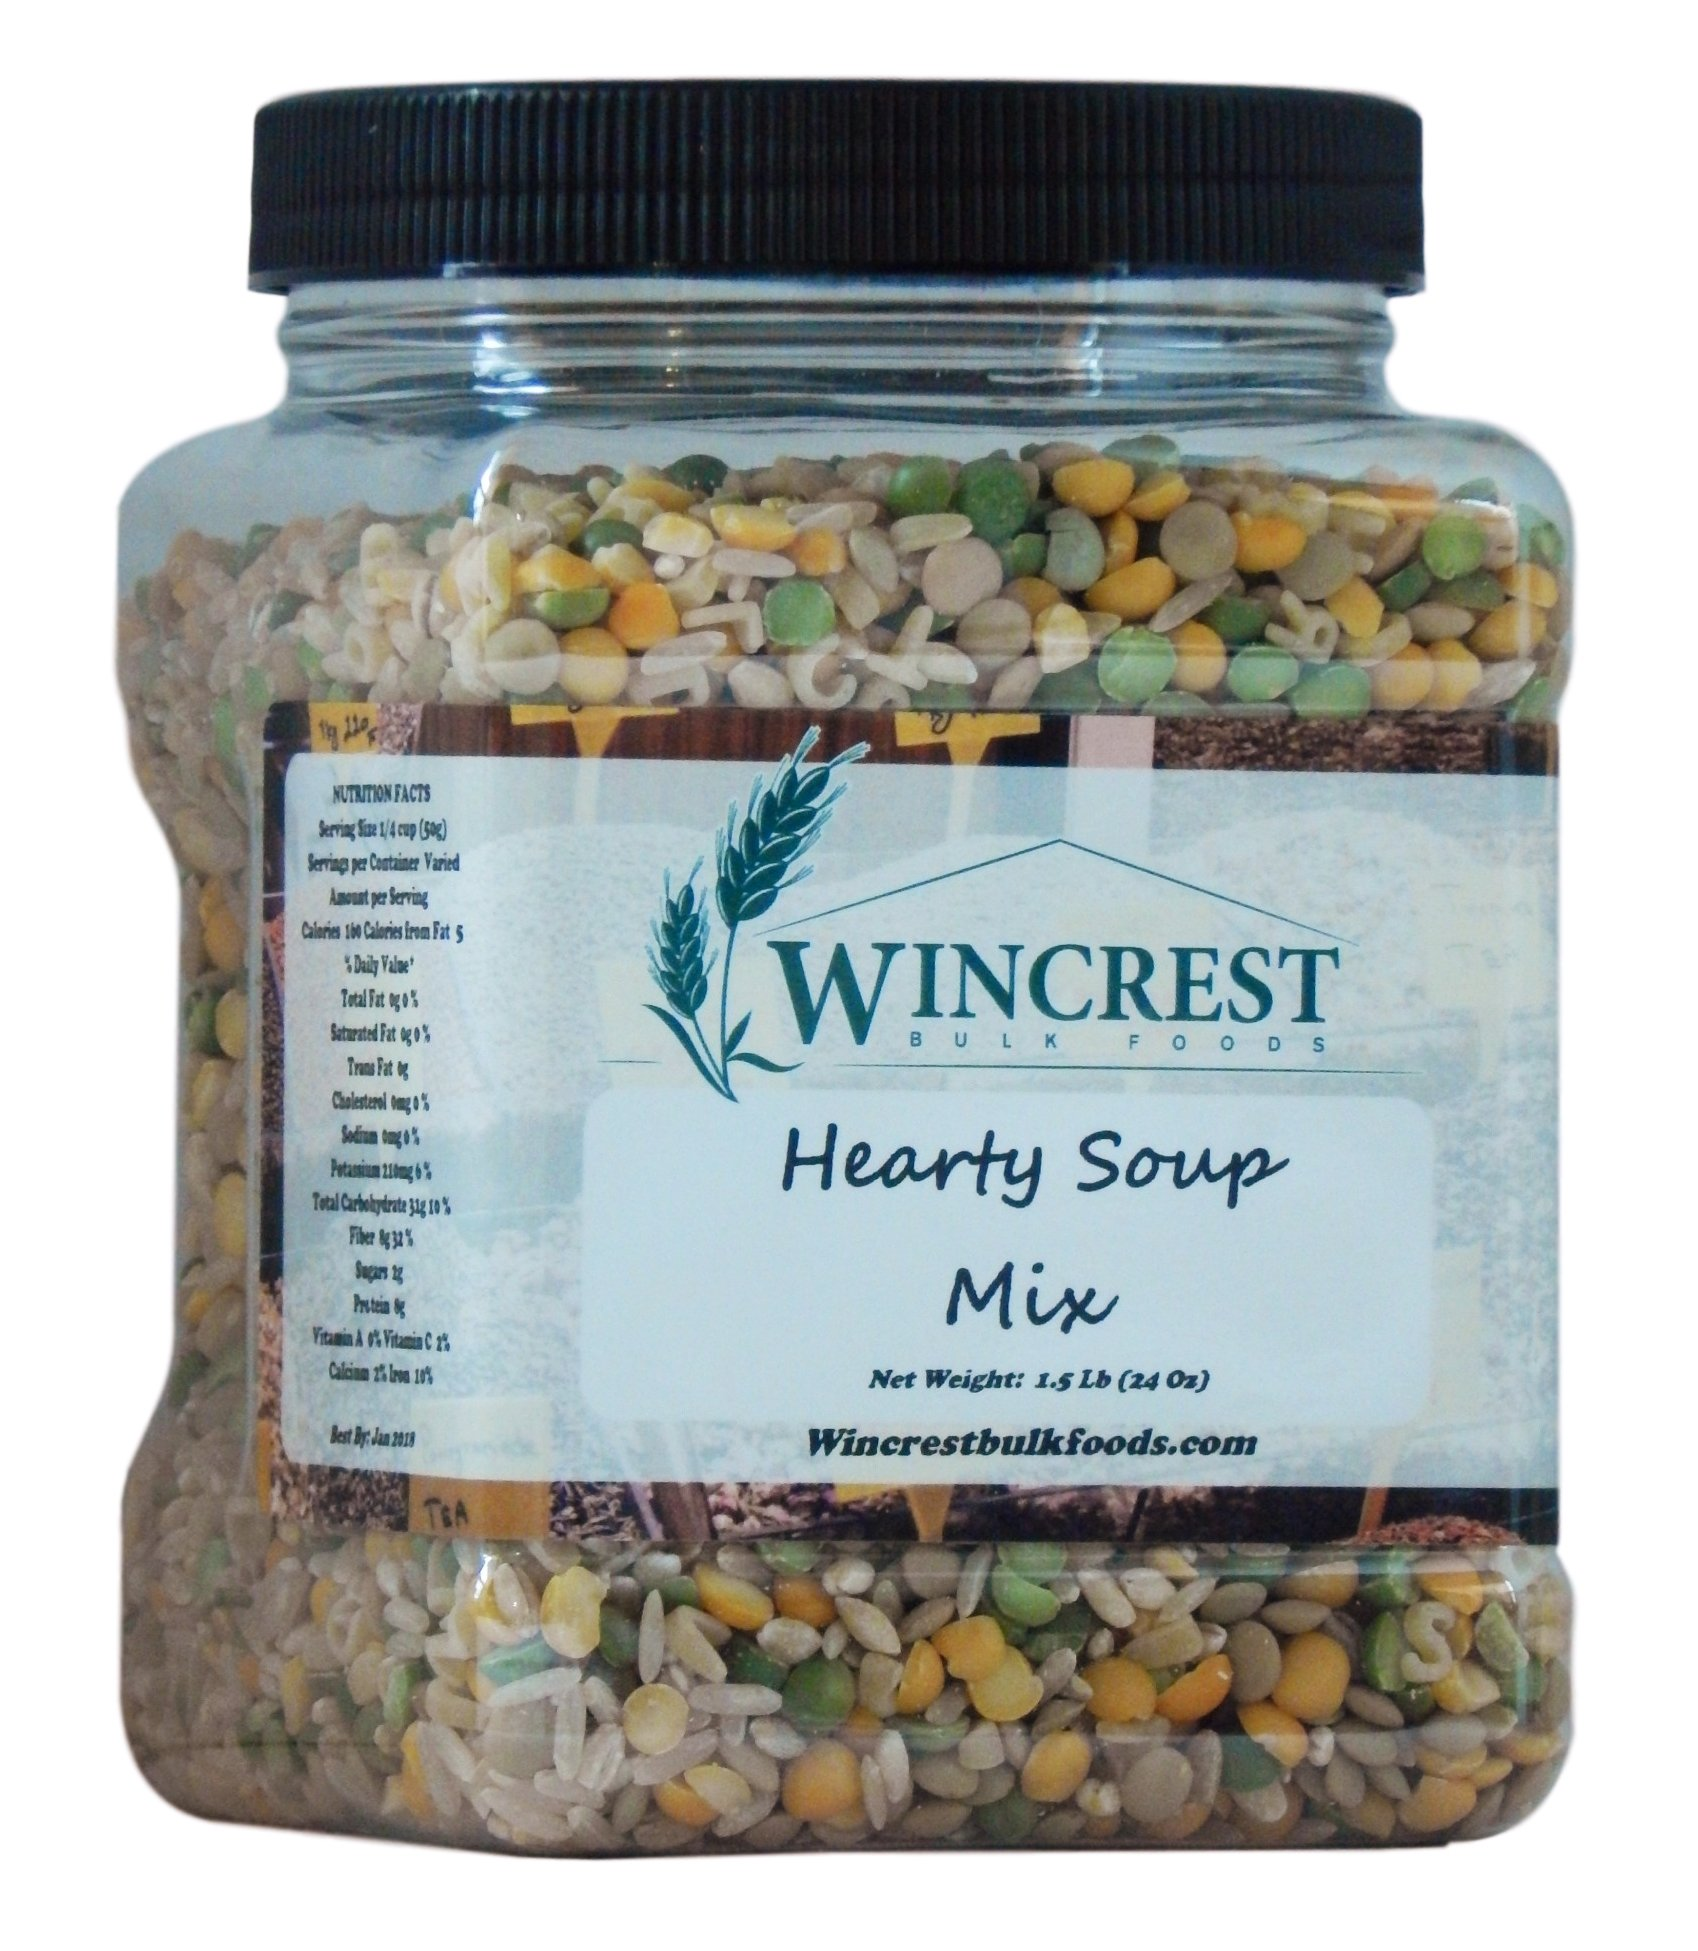 Hearty Soup Mix - 1.5 Lb (24 Oz) Tub